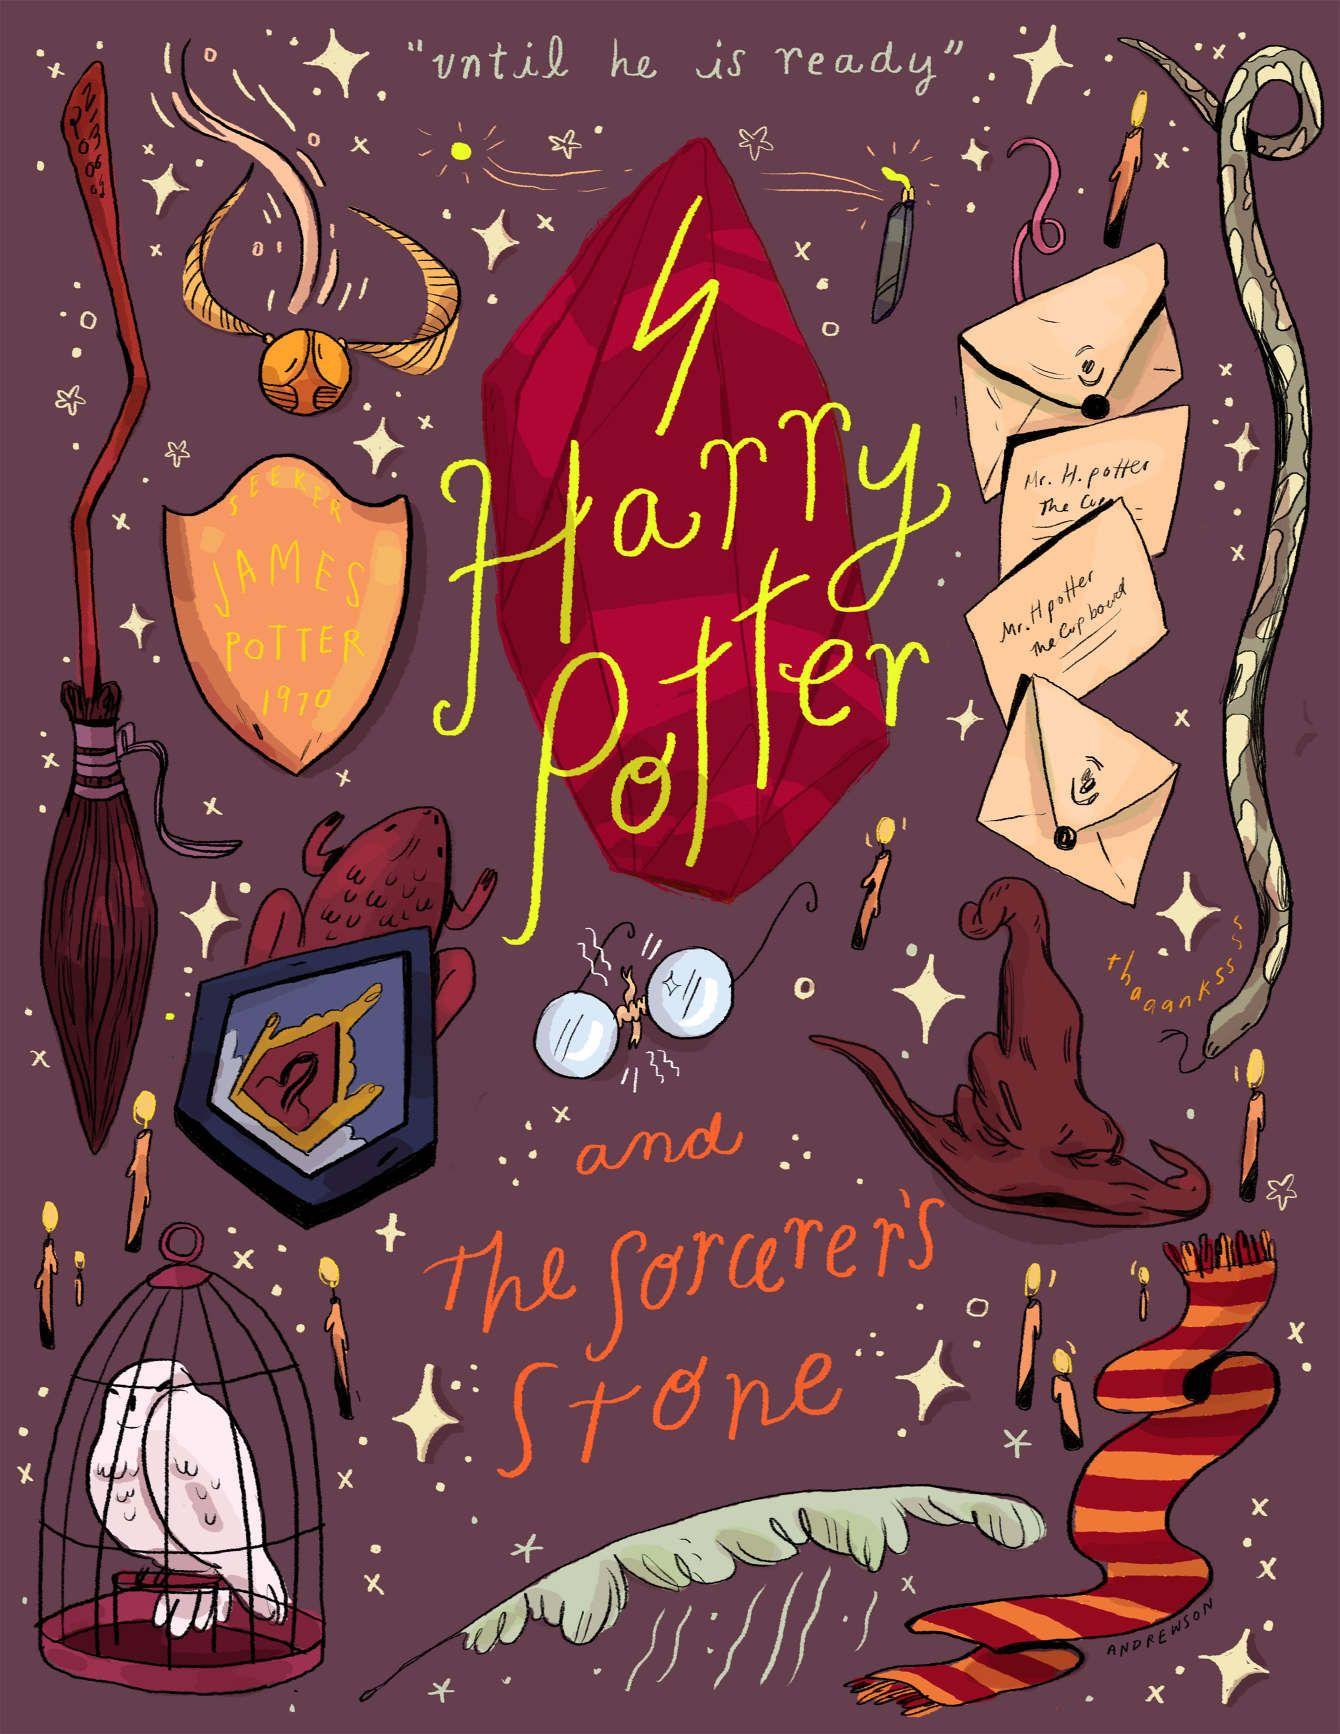 Harry potter posters harry potter poster harry potter